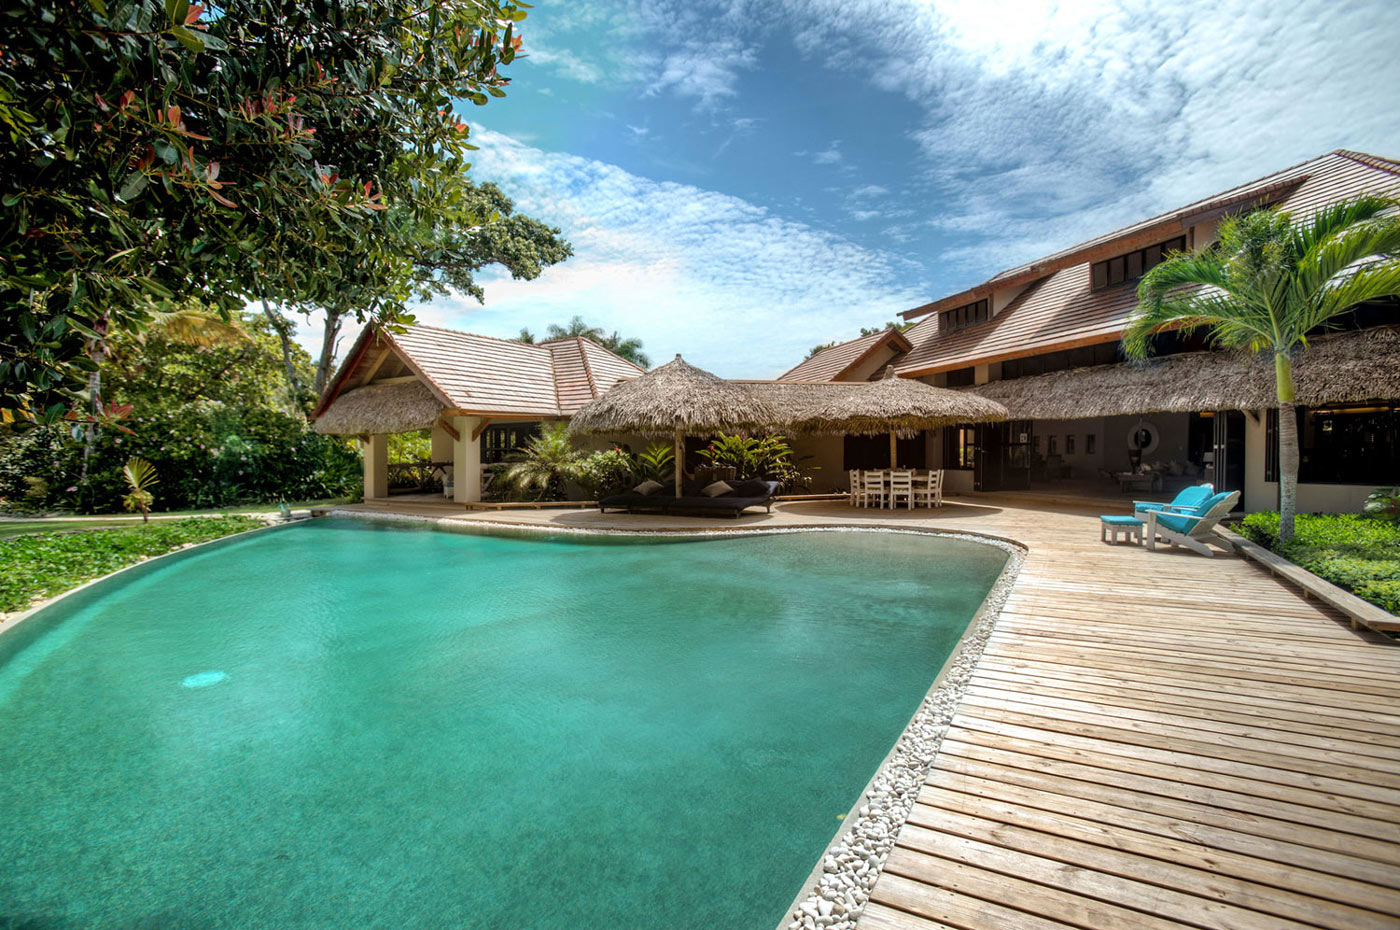 Enchanting Beachfront Villa in Sea Horse Ranch, Dominican Republic